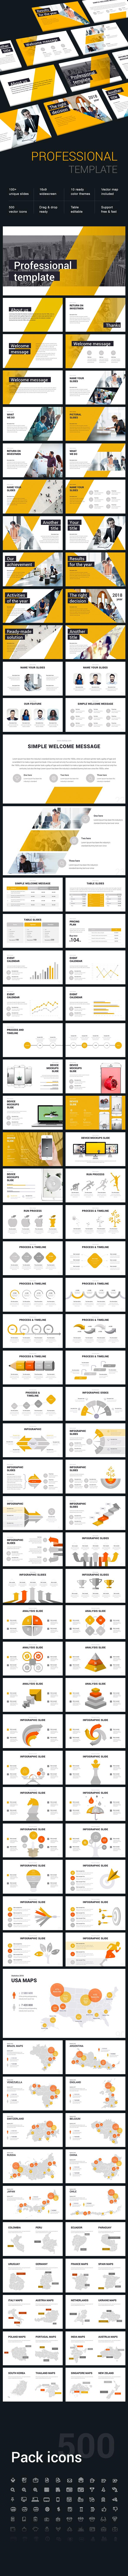 PRO Powerpoint Template for Google Slides - Google Slides Presentation Templates